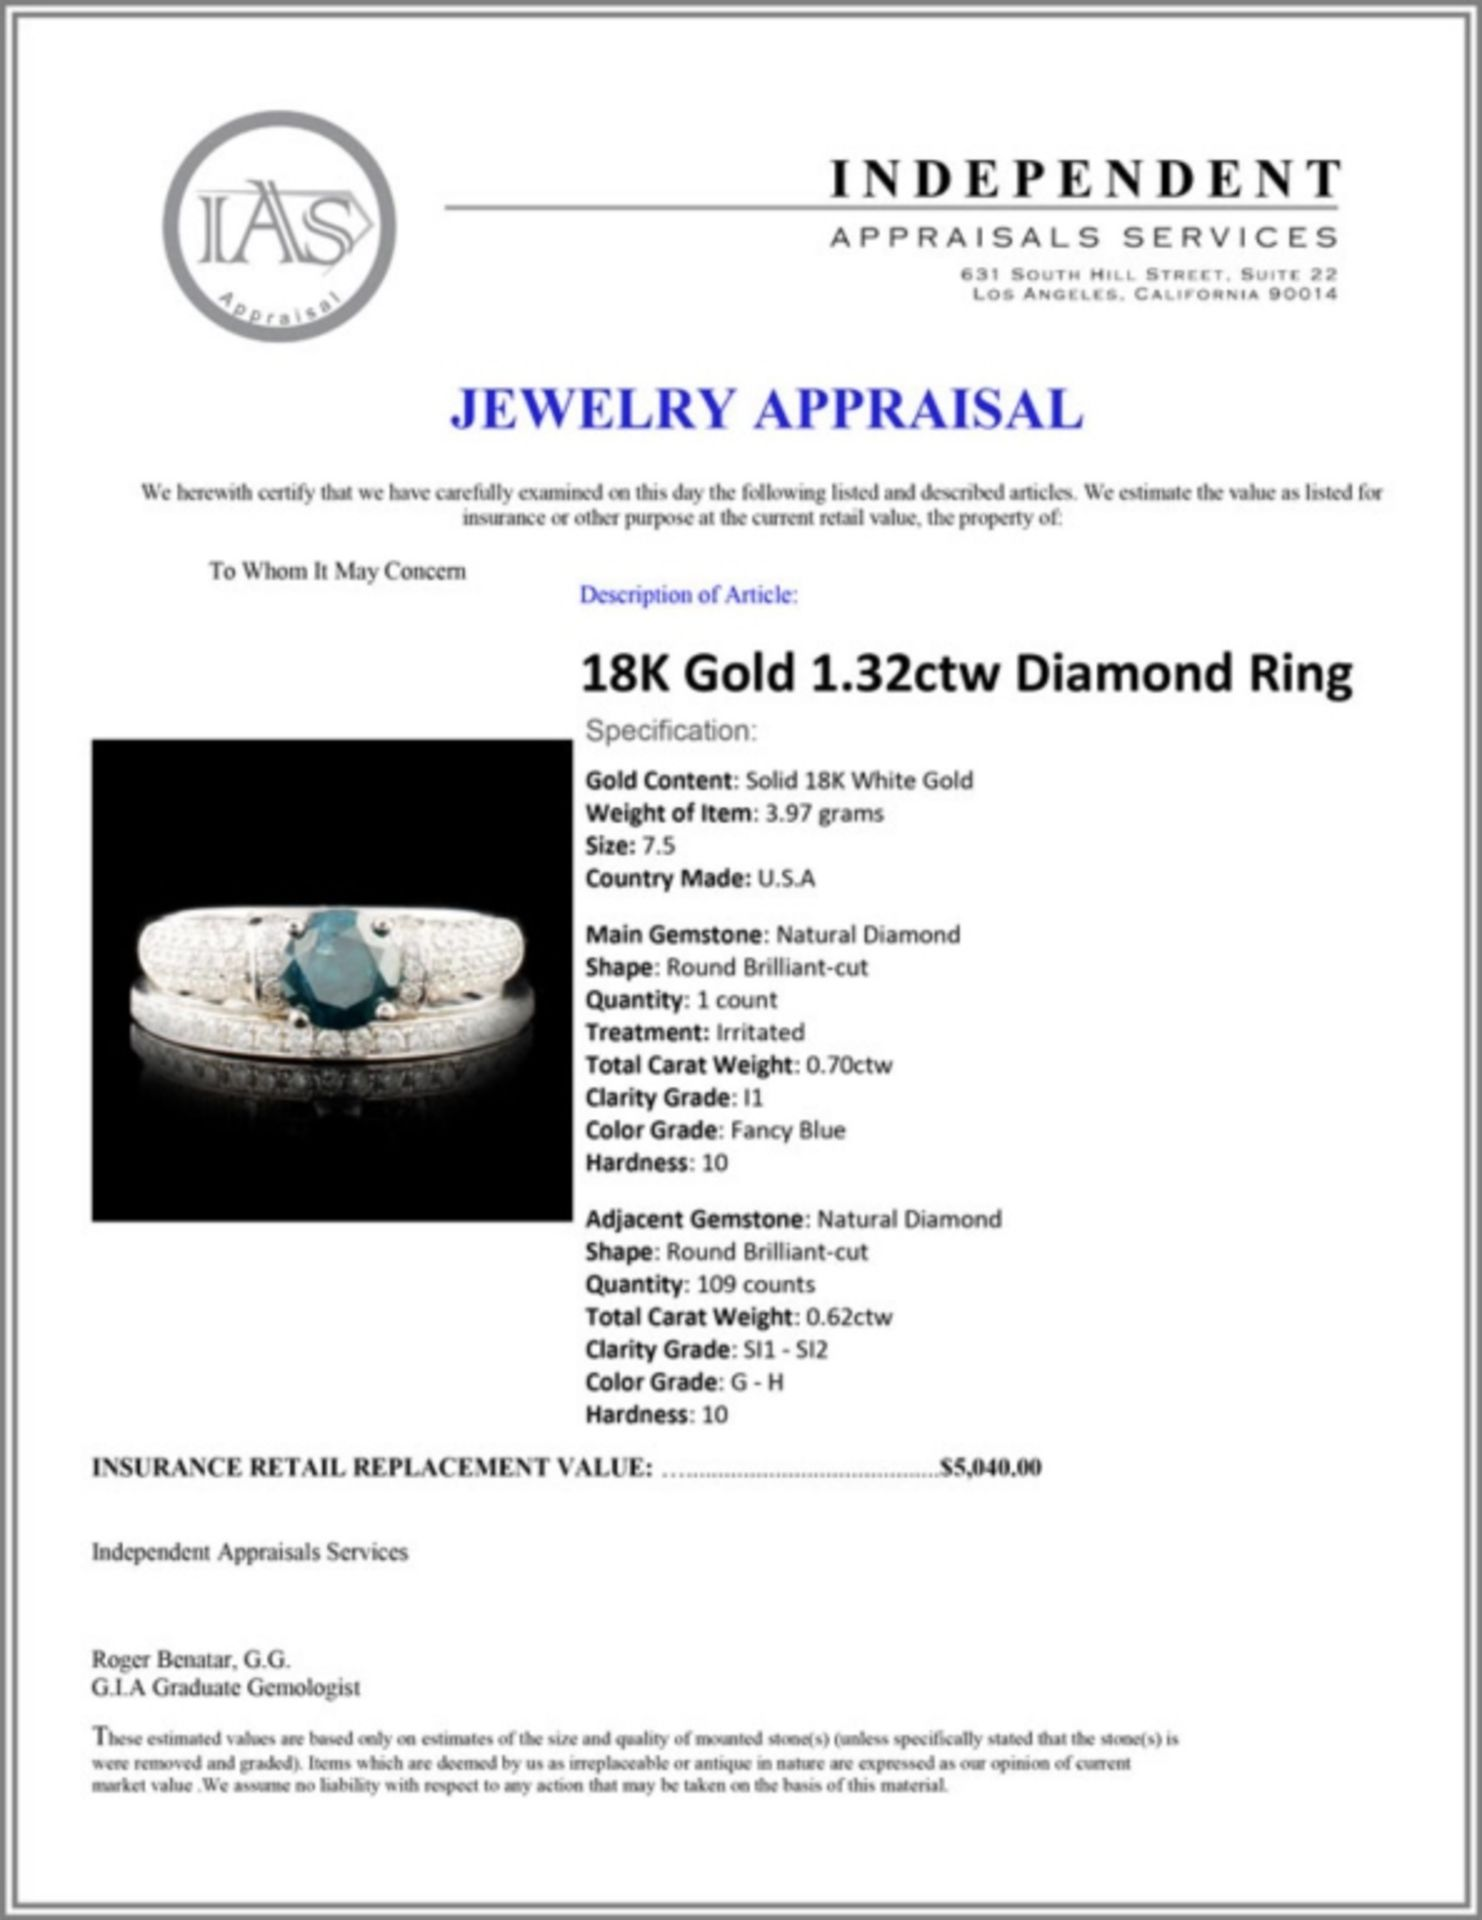 18K Gold 1.32ctw Diamond Ring - Image 5 of 5